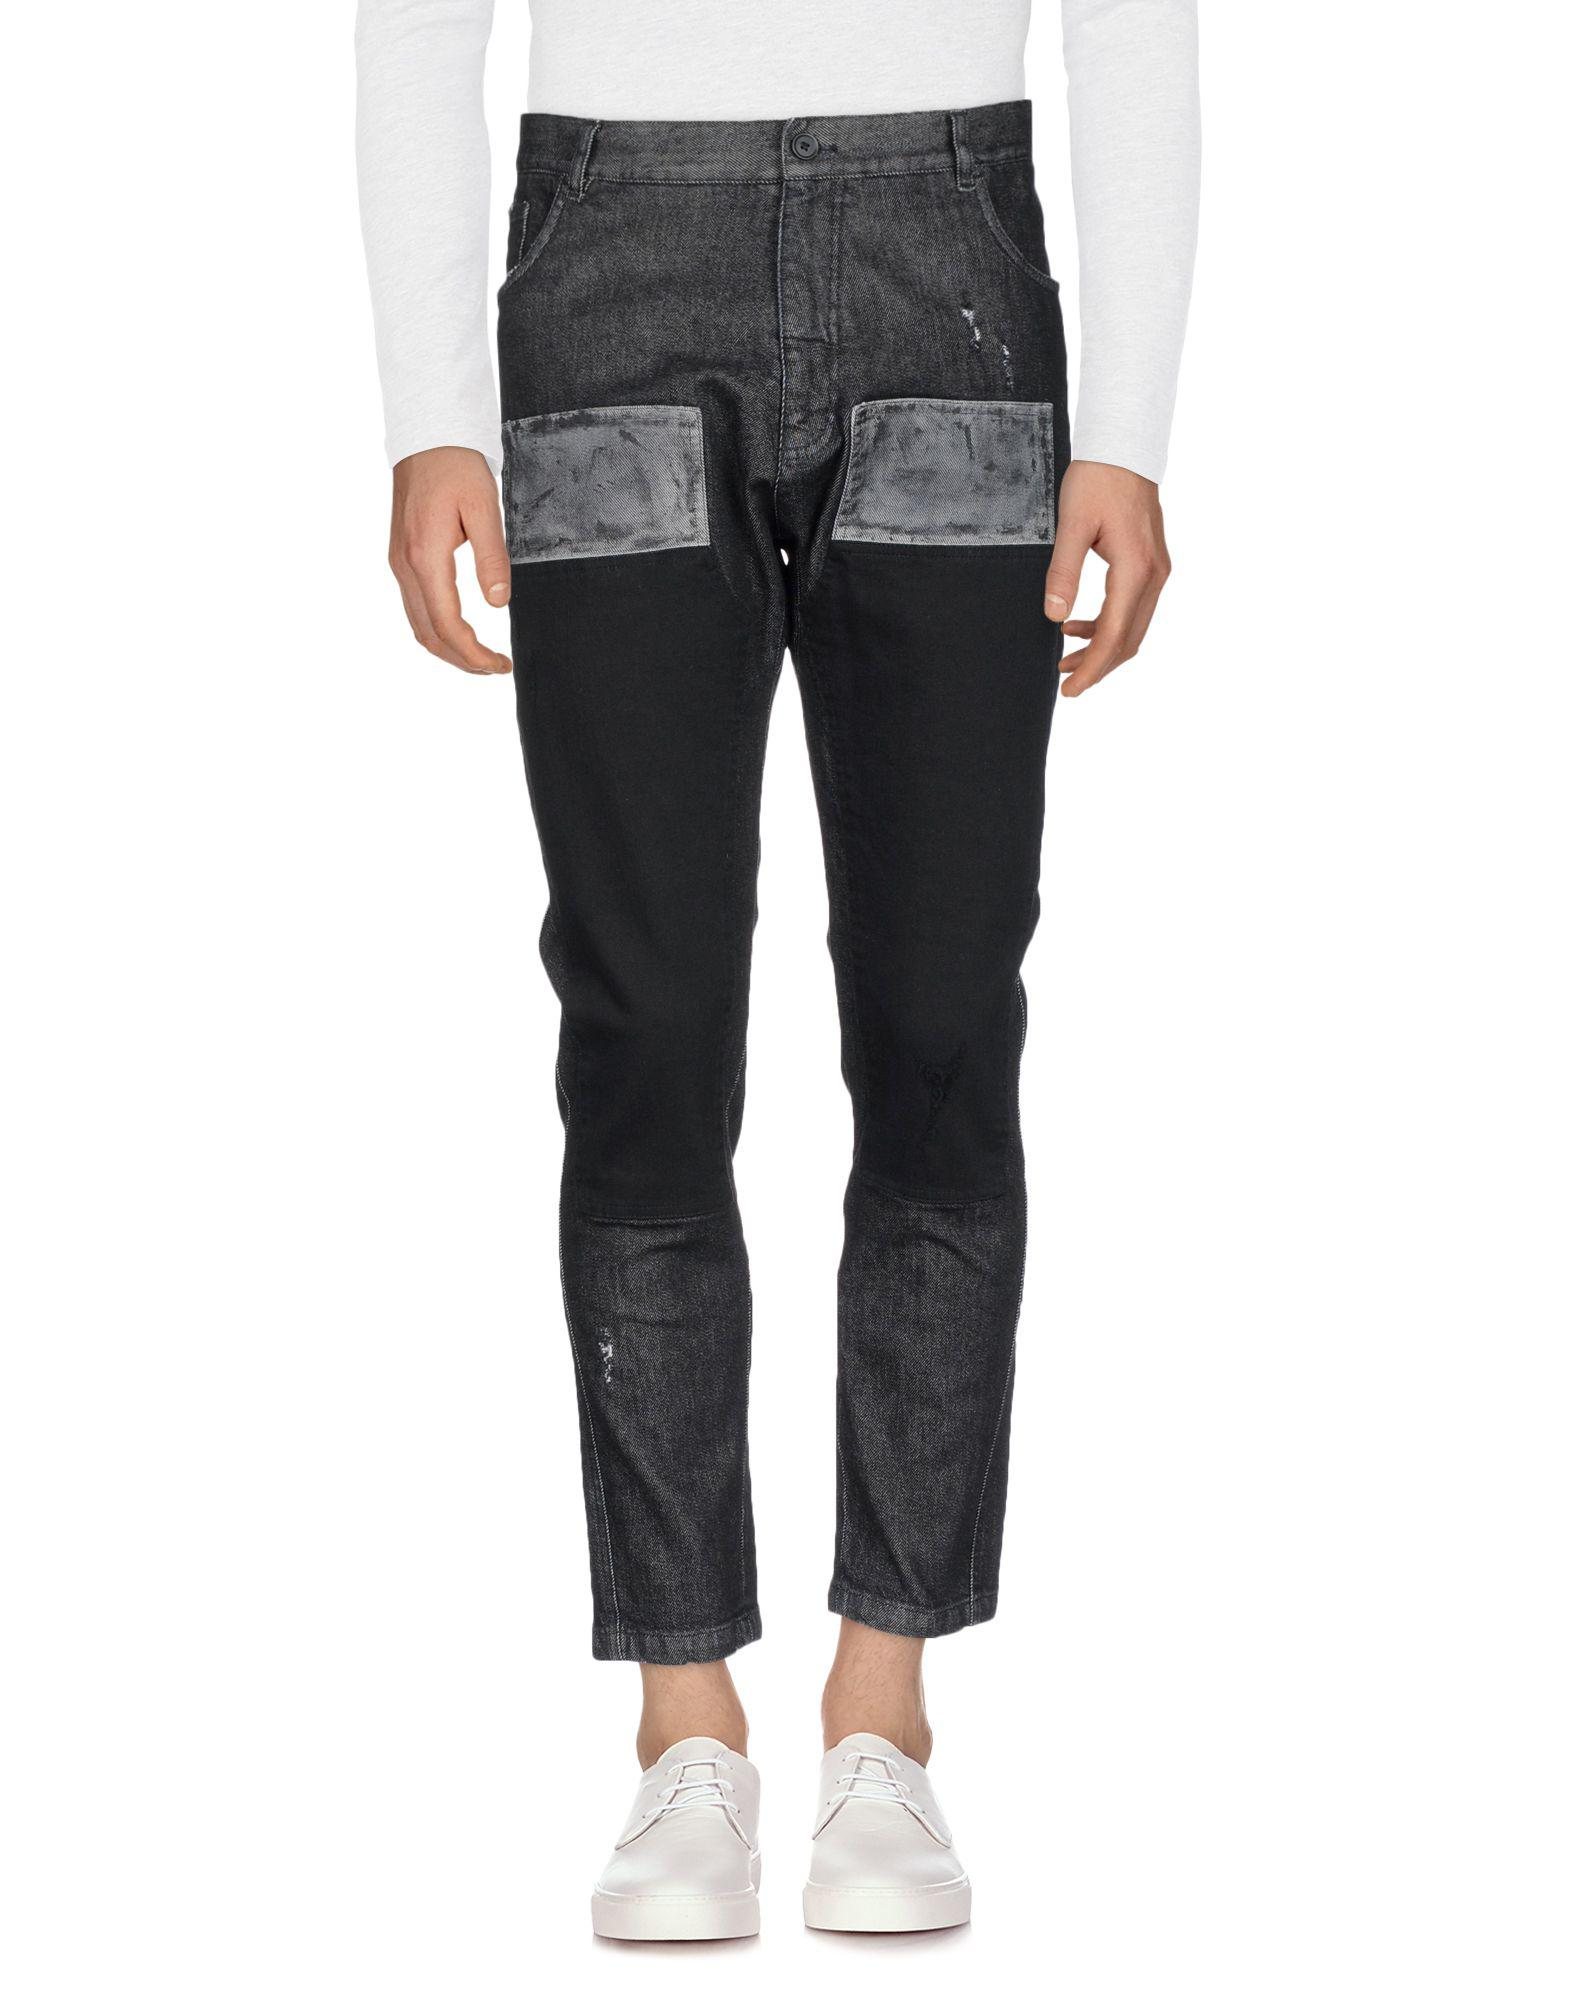 DENIM - Denim trousers Antonio Marras rf4I5Jq